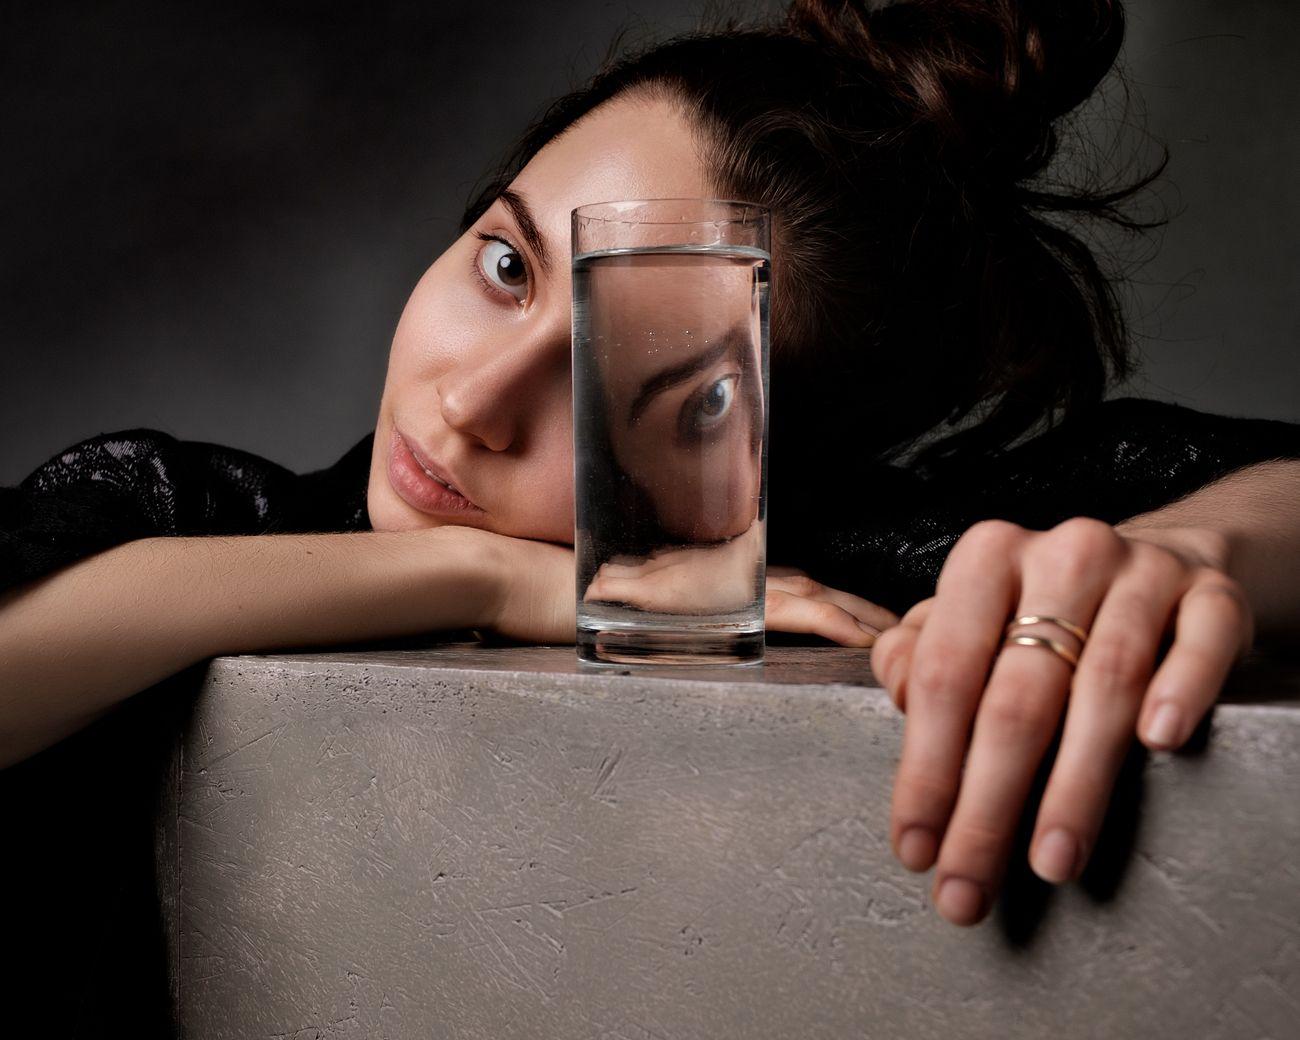 Capture The Eye Photo Contest Winner